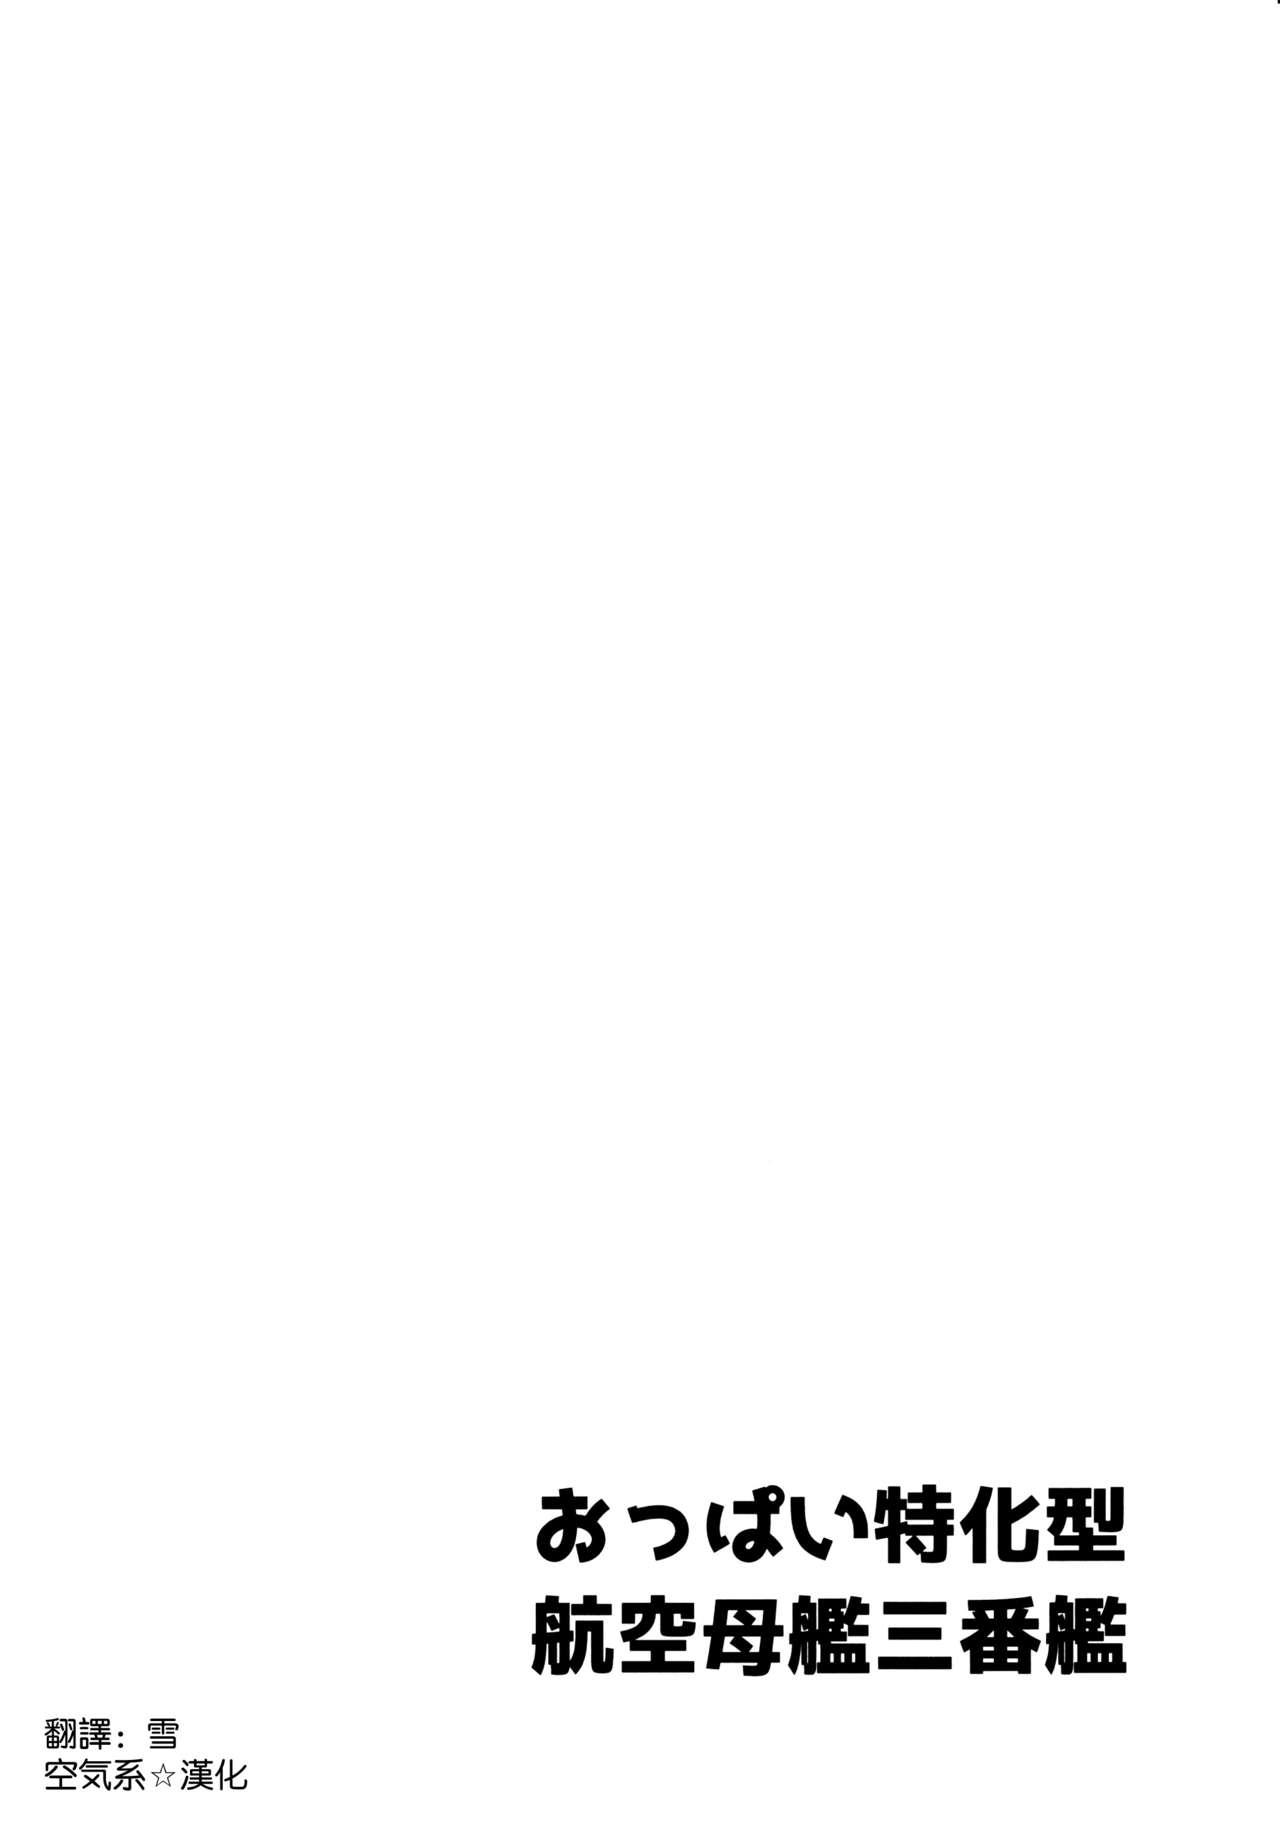 Formidable no Oppai ga Momitakute Shikataganai 3